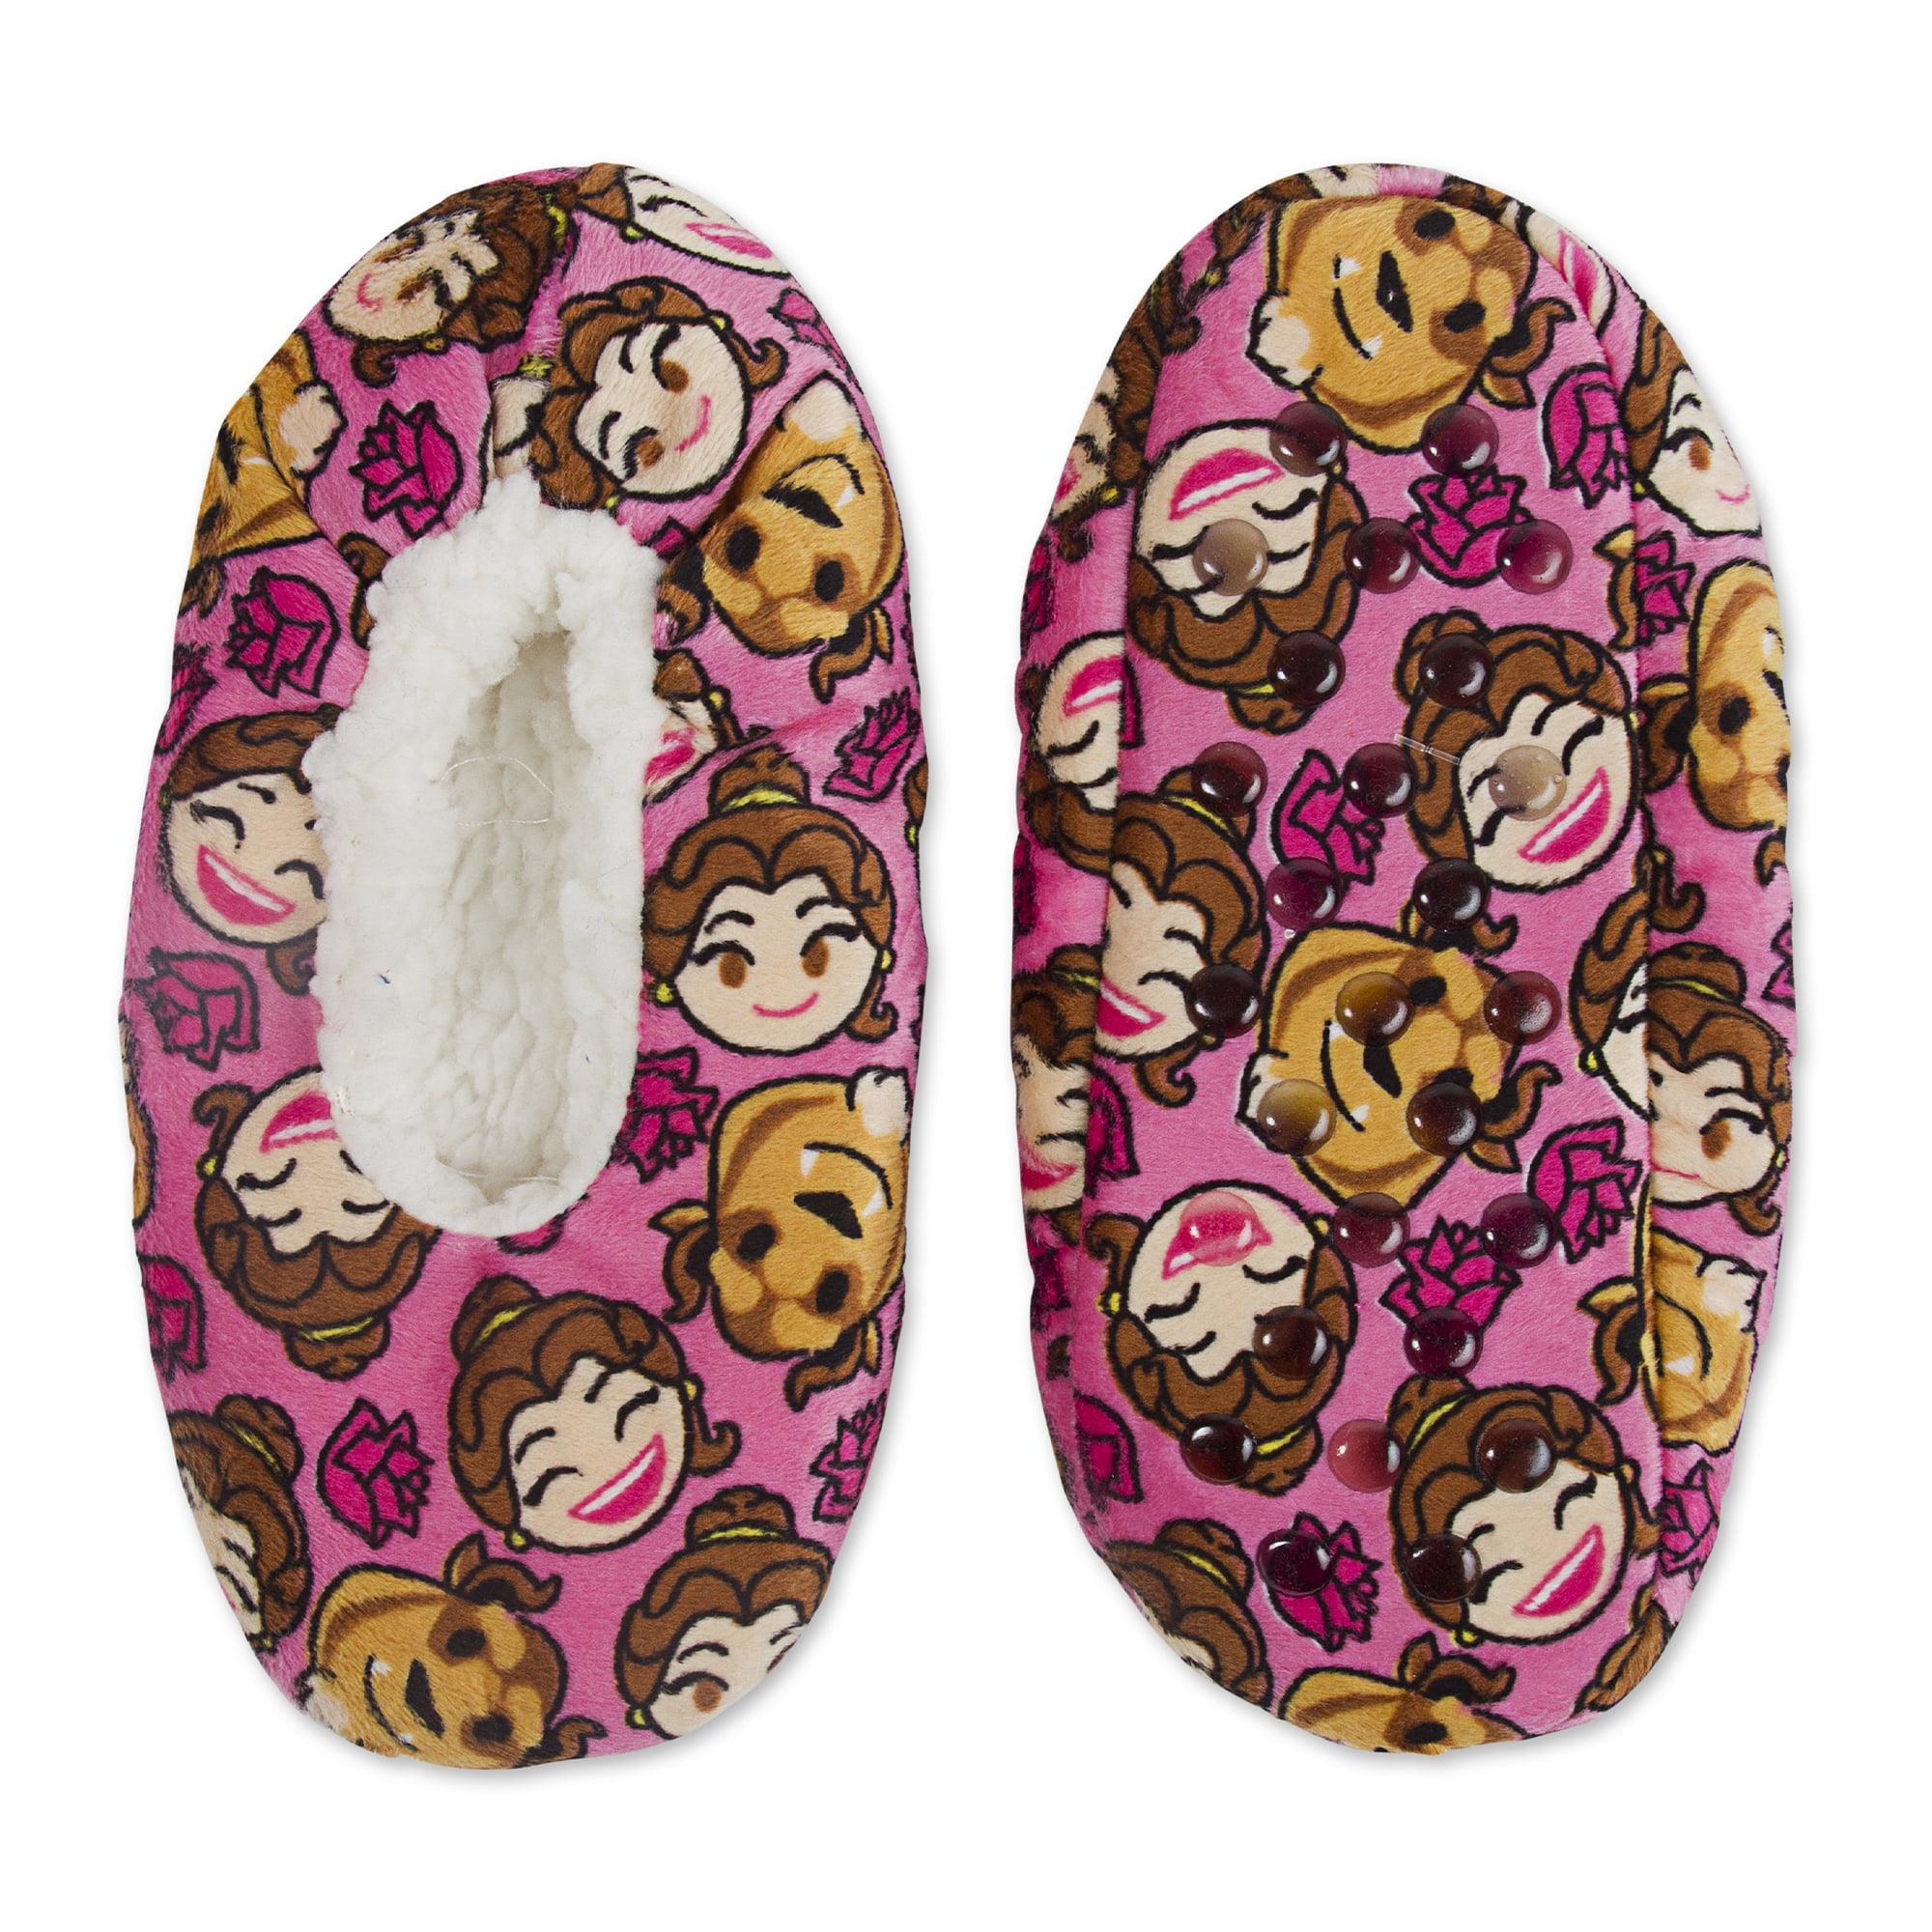 Girls' Beauty and the Beast Fuzzy Babba Socks